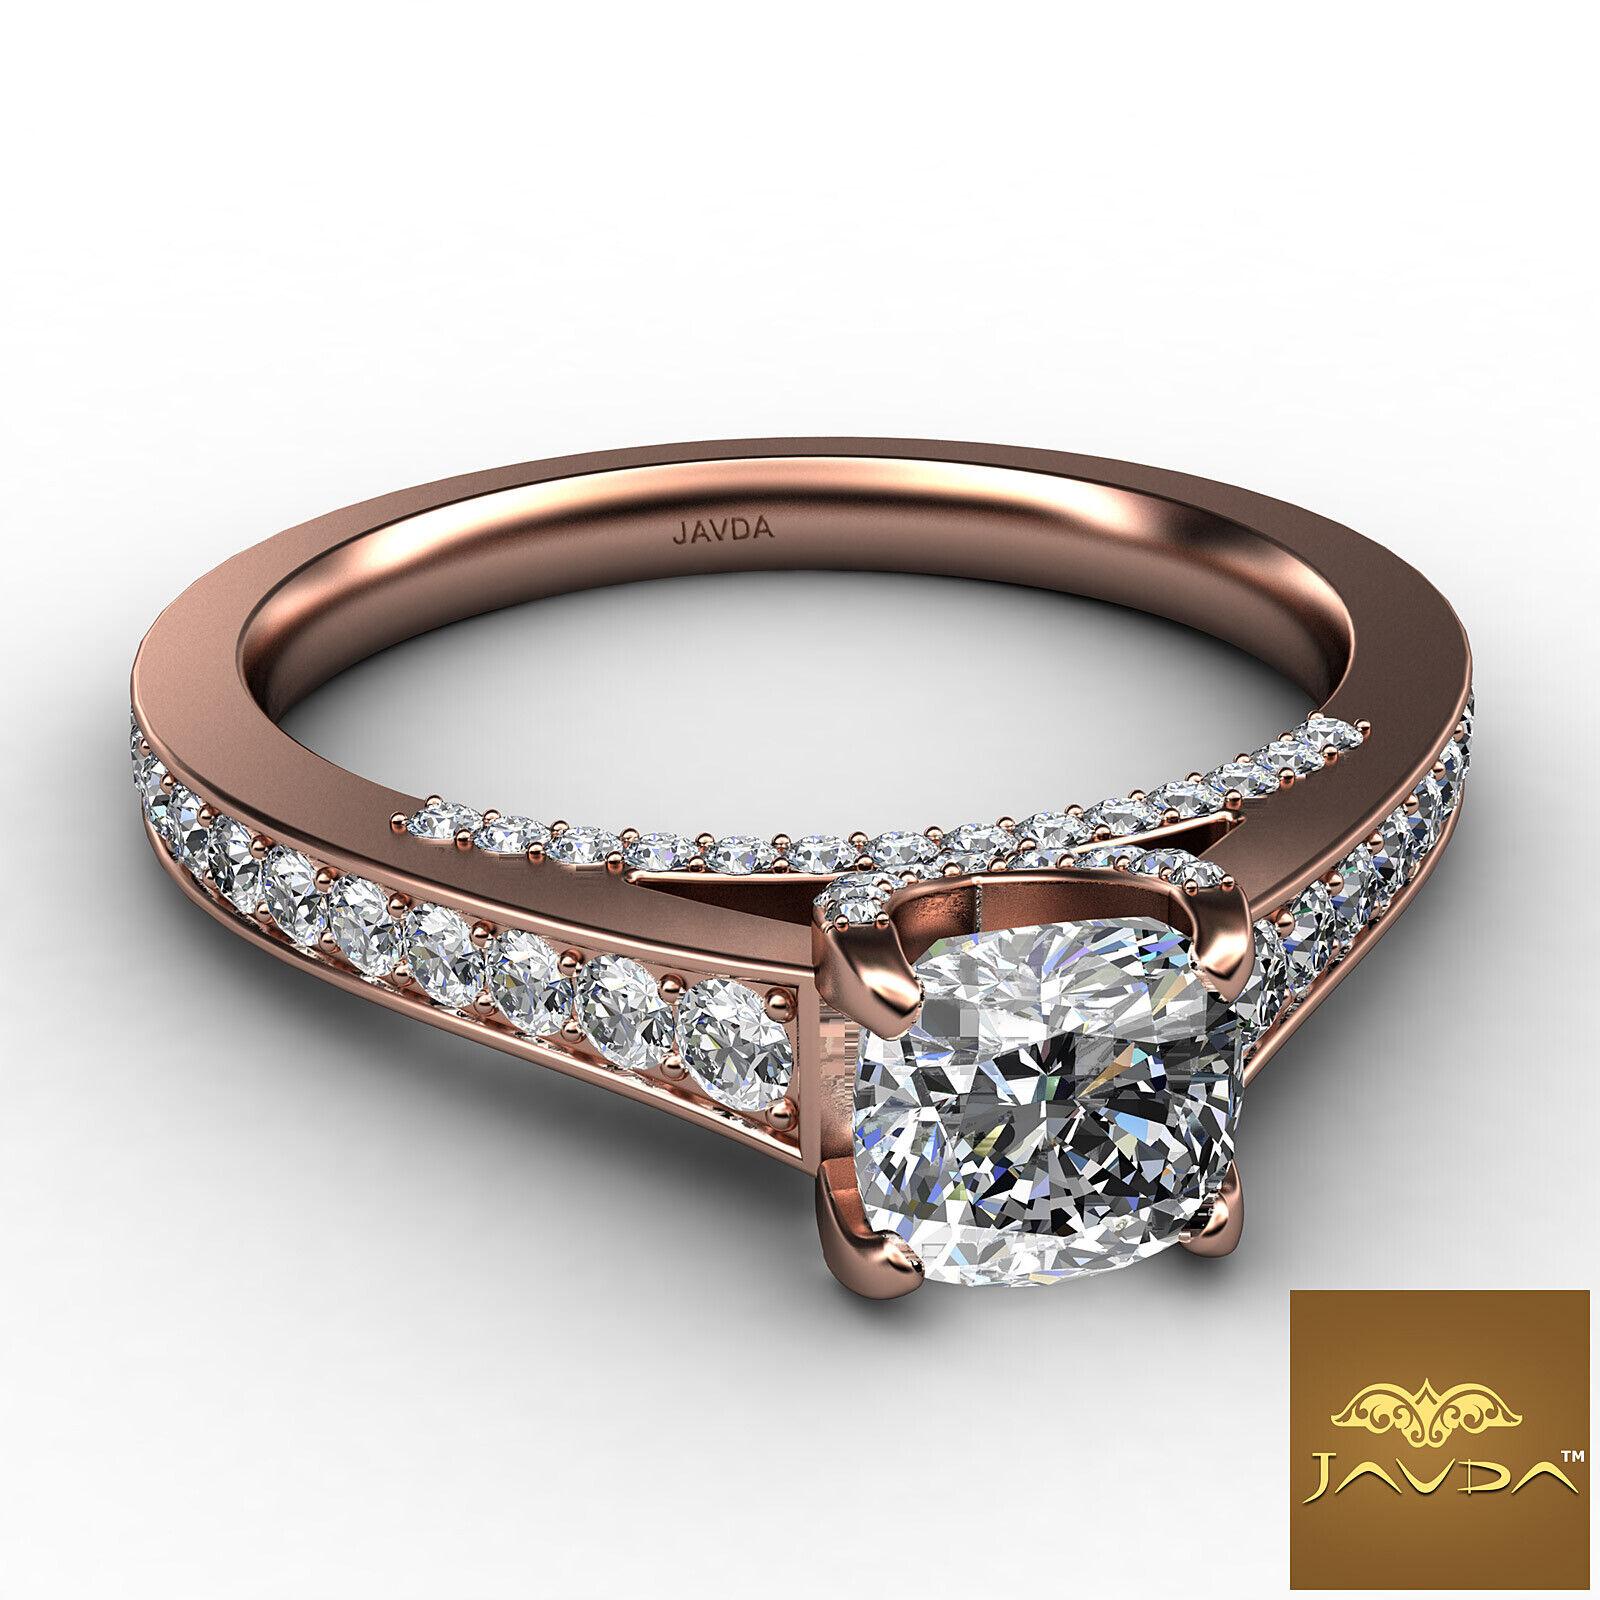 Cushion Cut Diamond Flawless Engagement GIA G VVS2 Pave Set Ring Platinum 1.25Ct 9